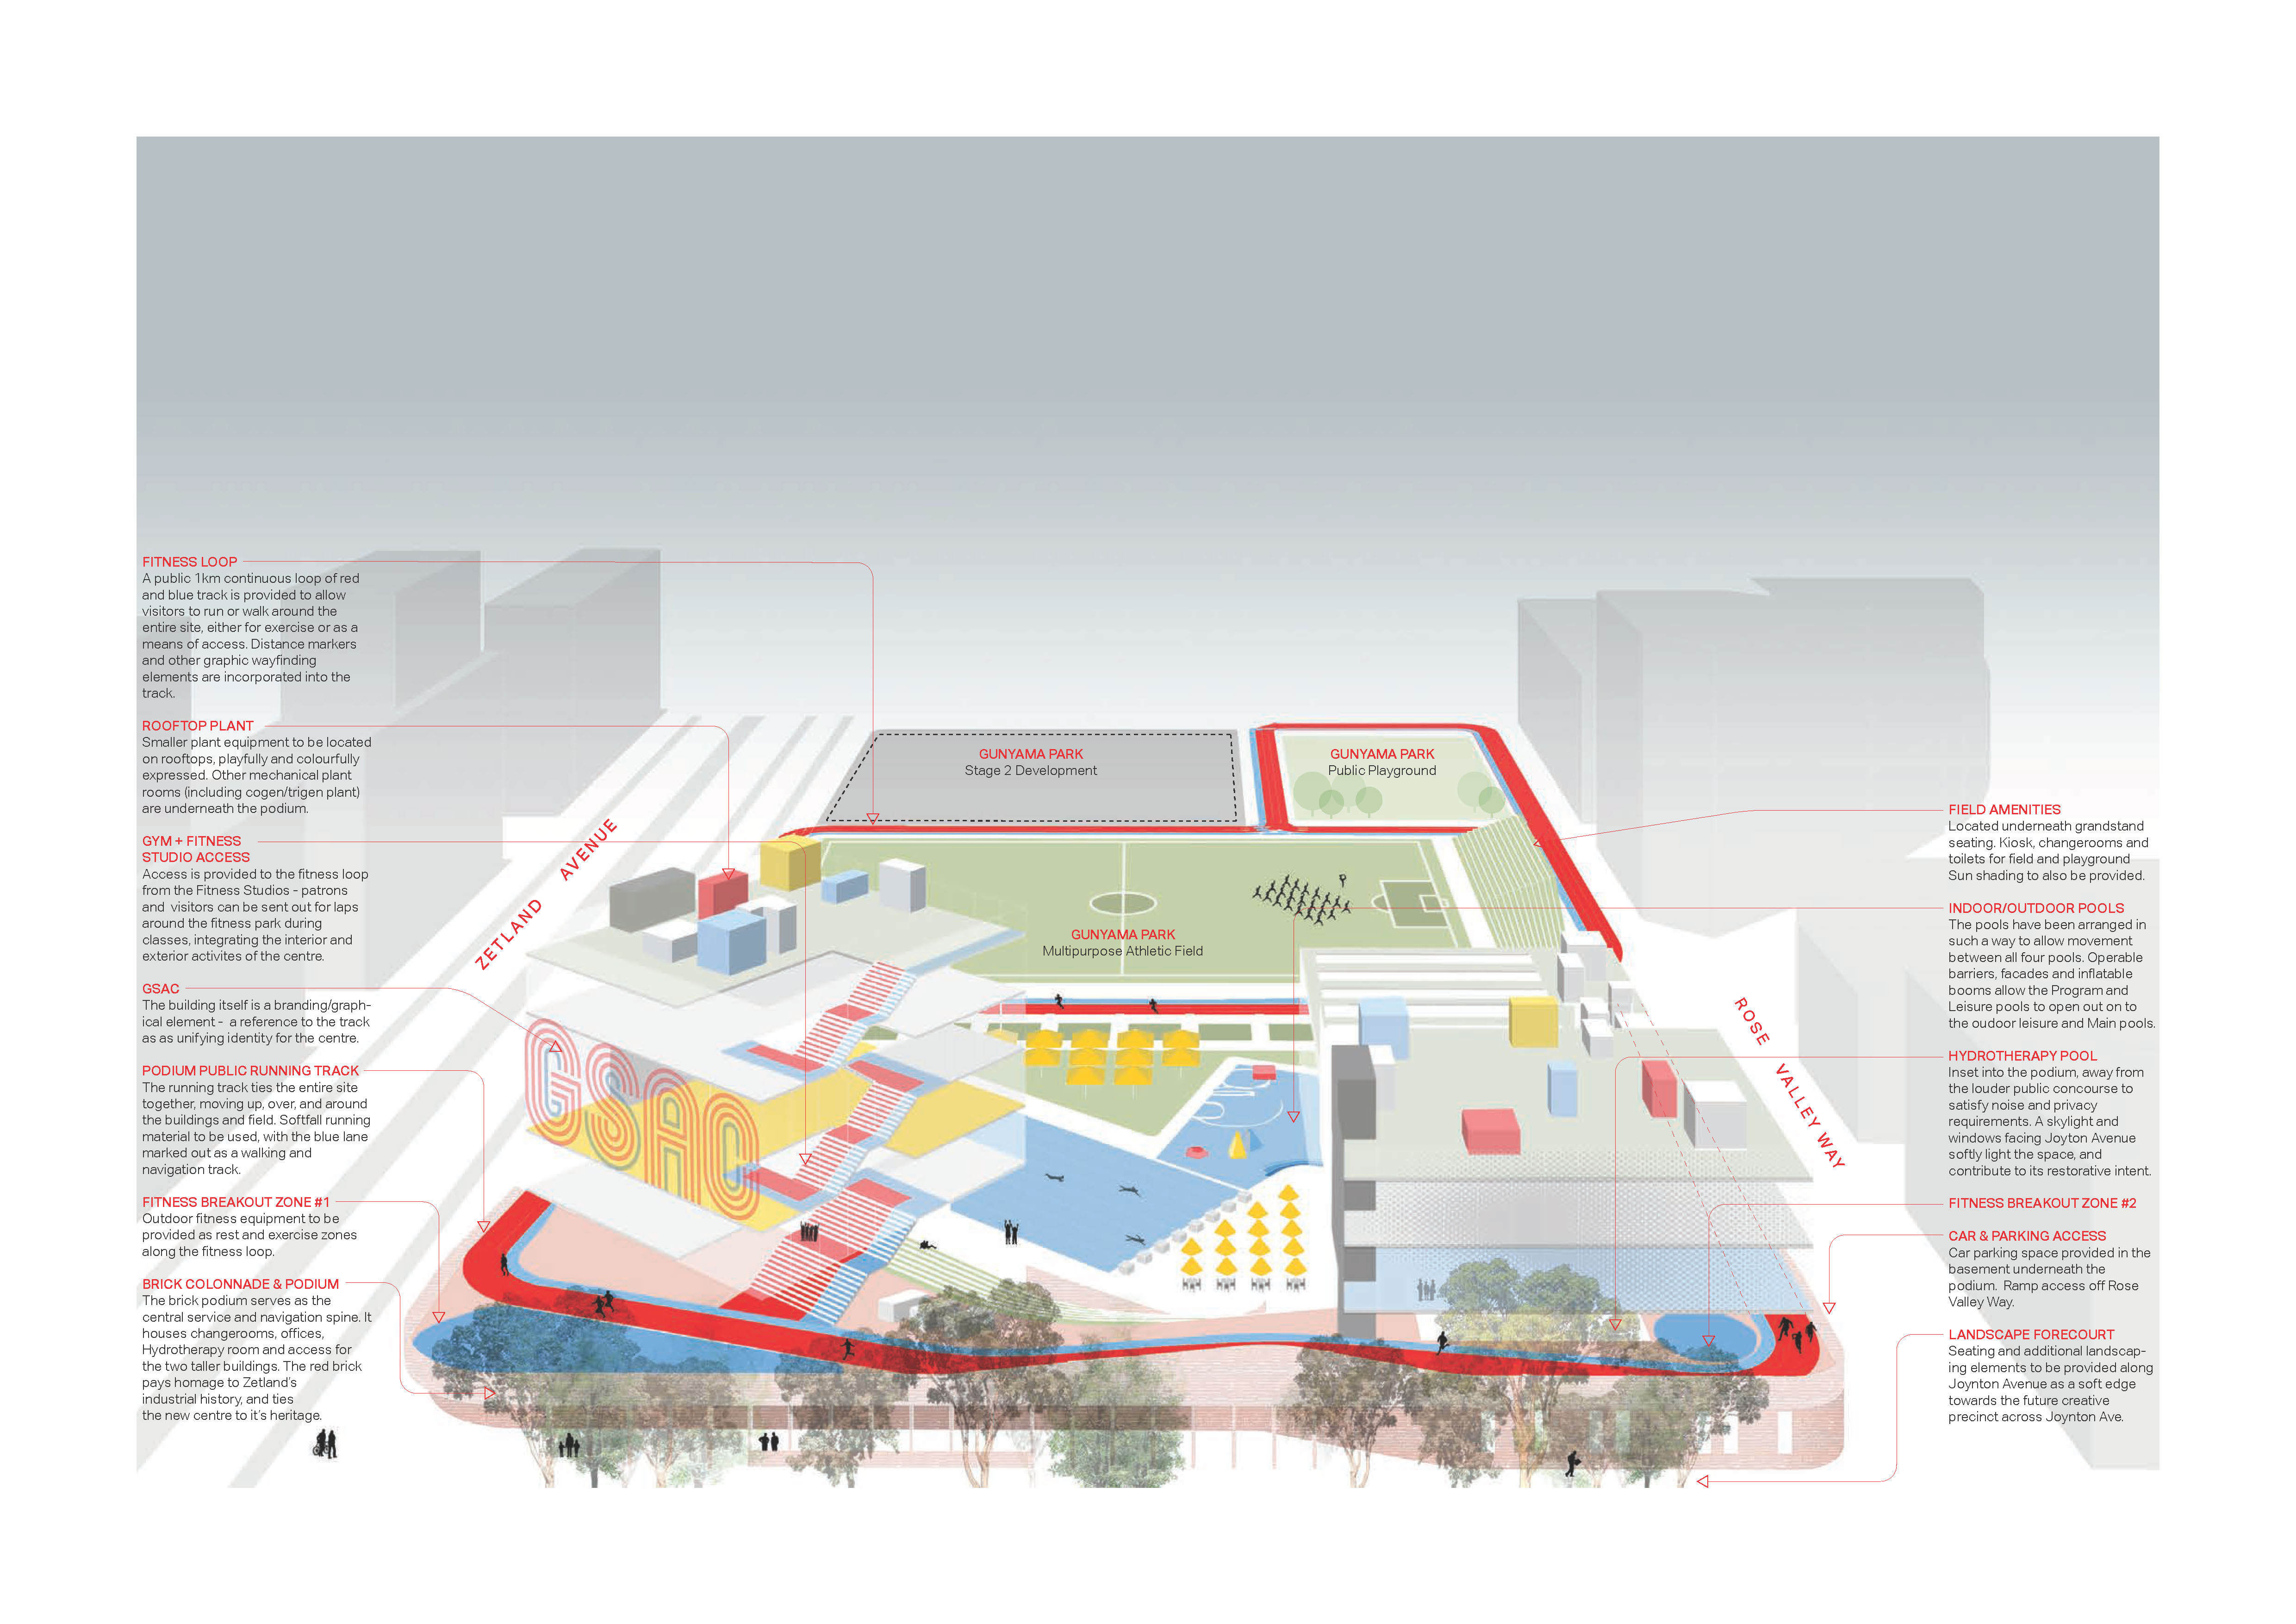 Green Square Aquatic Centre Stage 1 Presentation Submission